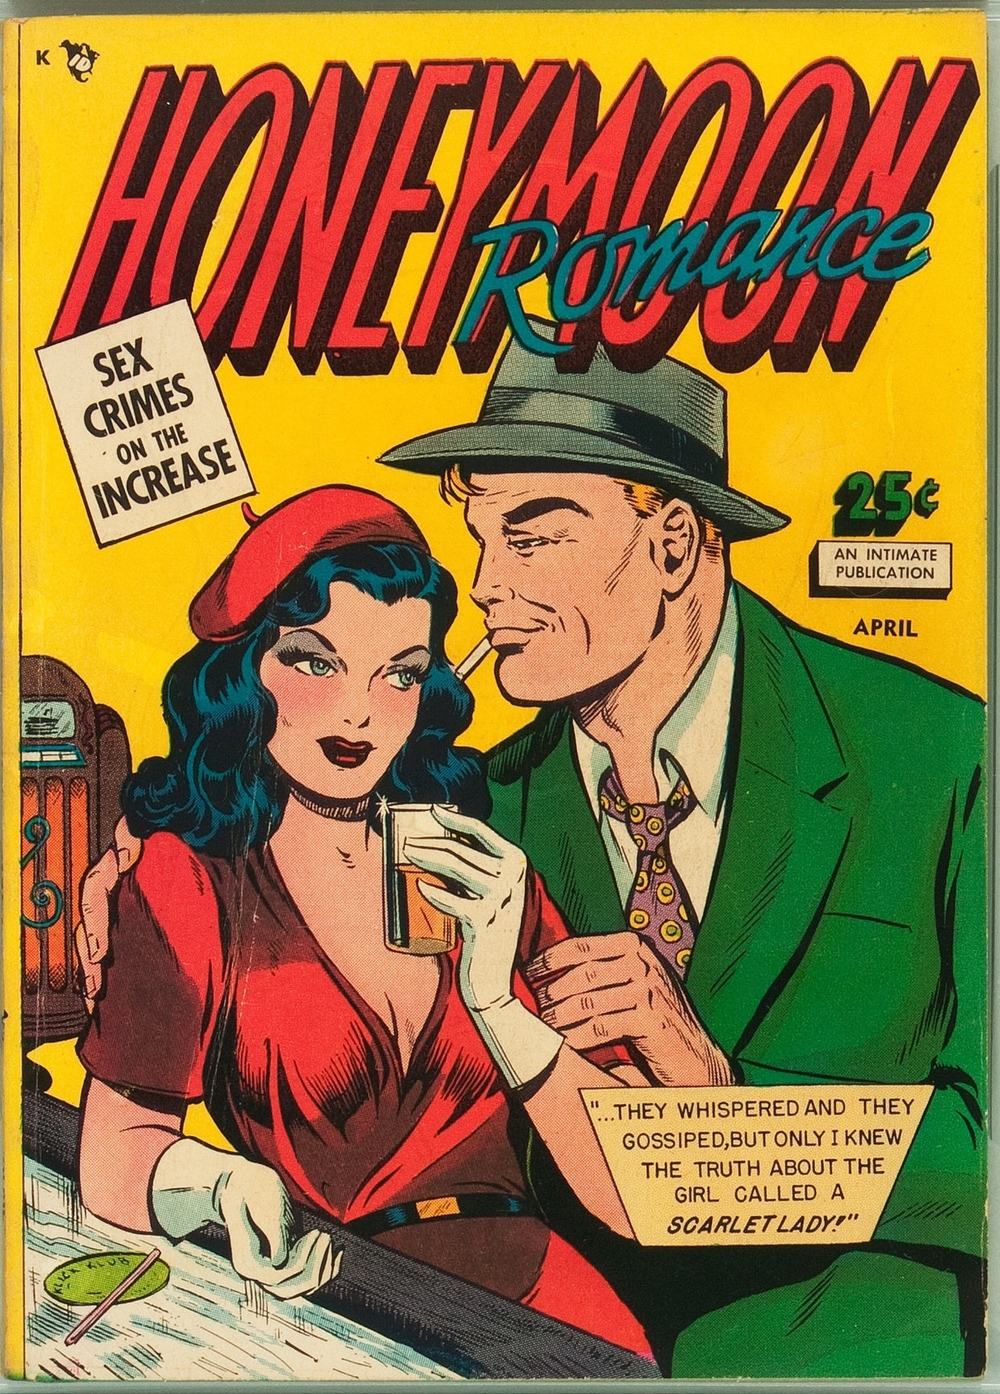 The seamy side of love: Honeymoon Romances #1 (Artful Publications, 1950)  via